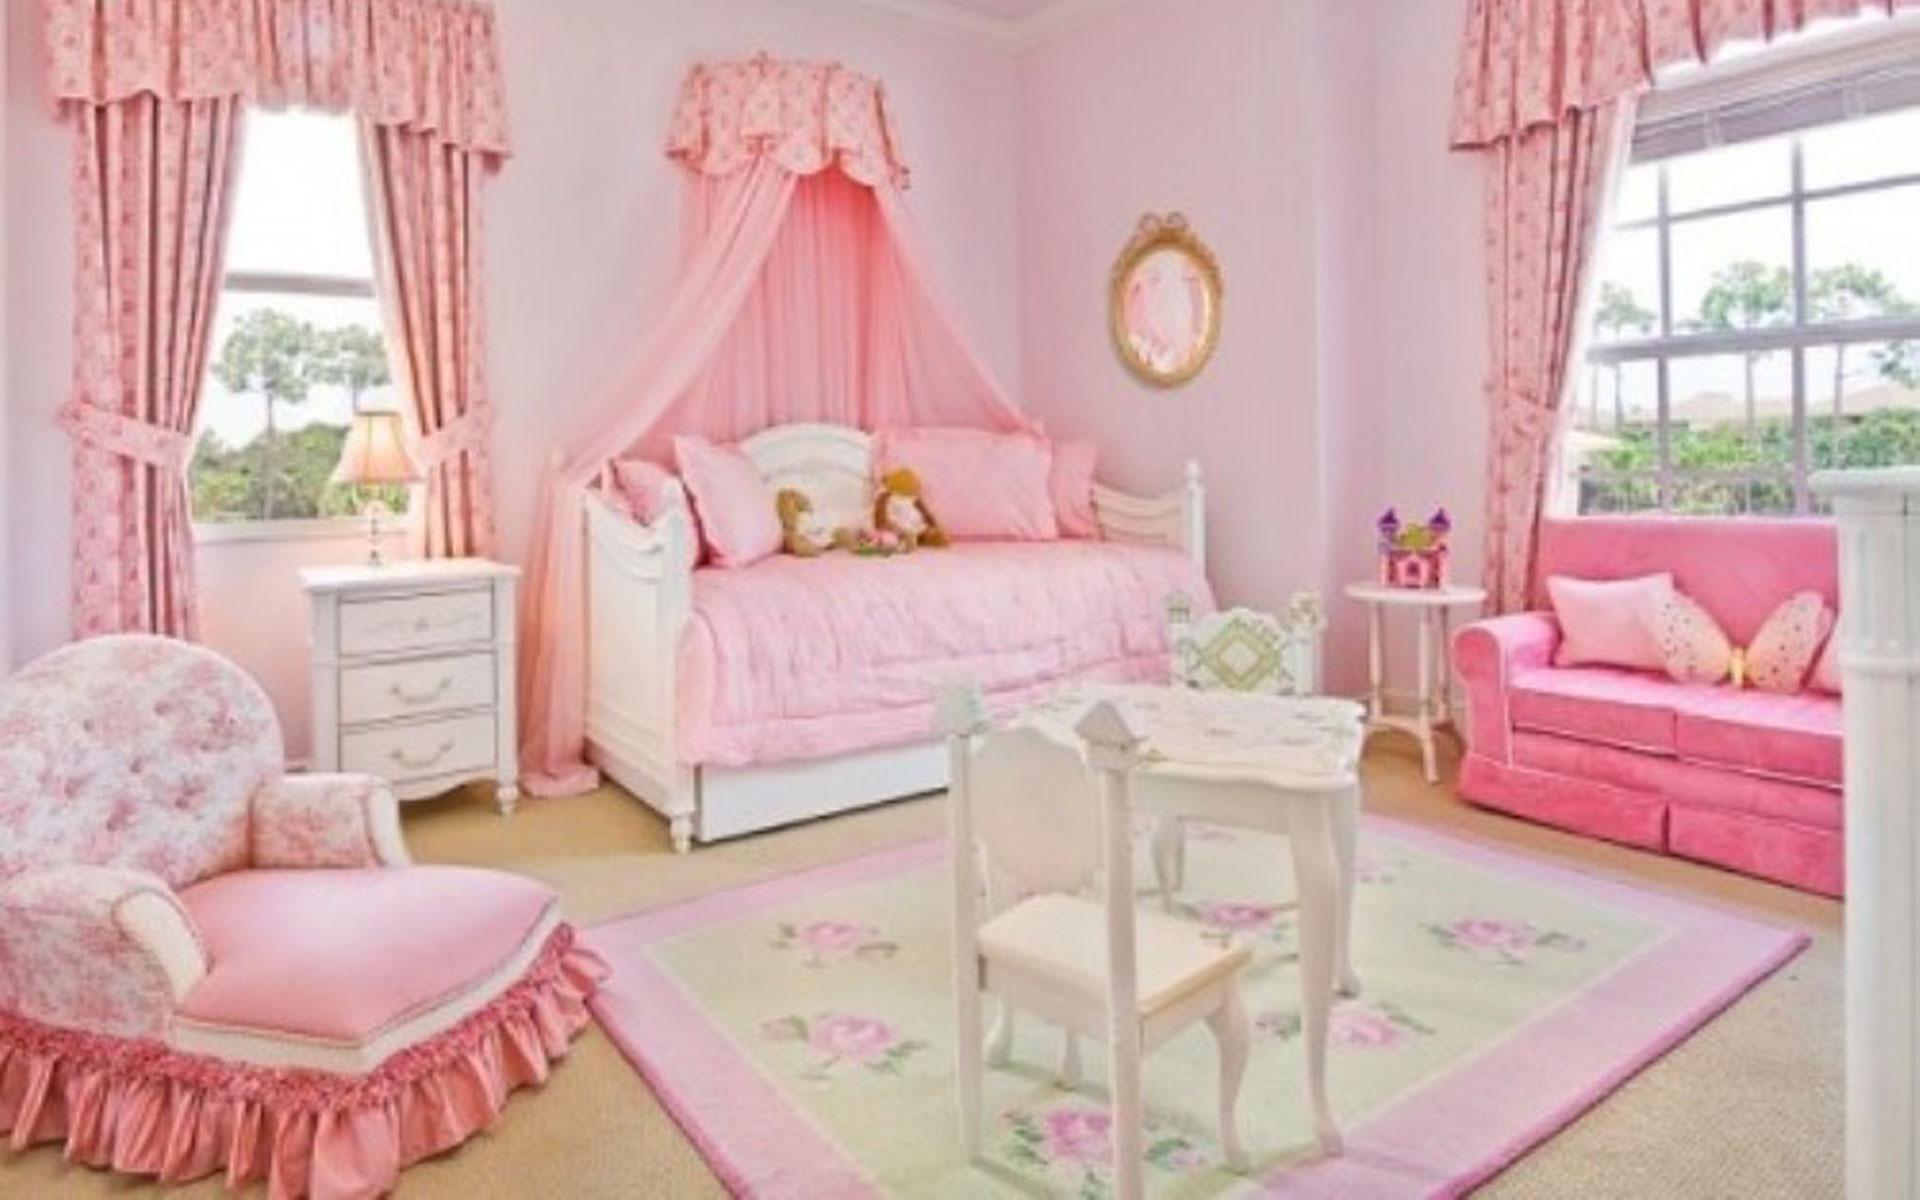 بالصور صور غرف بنات , اجمل صور لغرف البنات 2019 3282 16